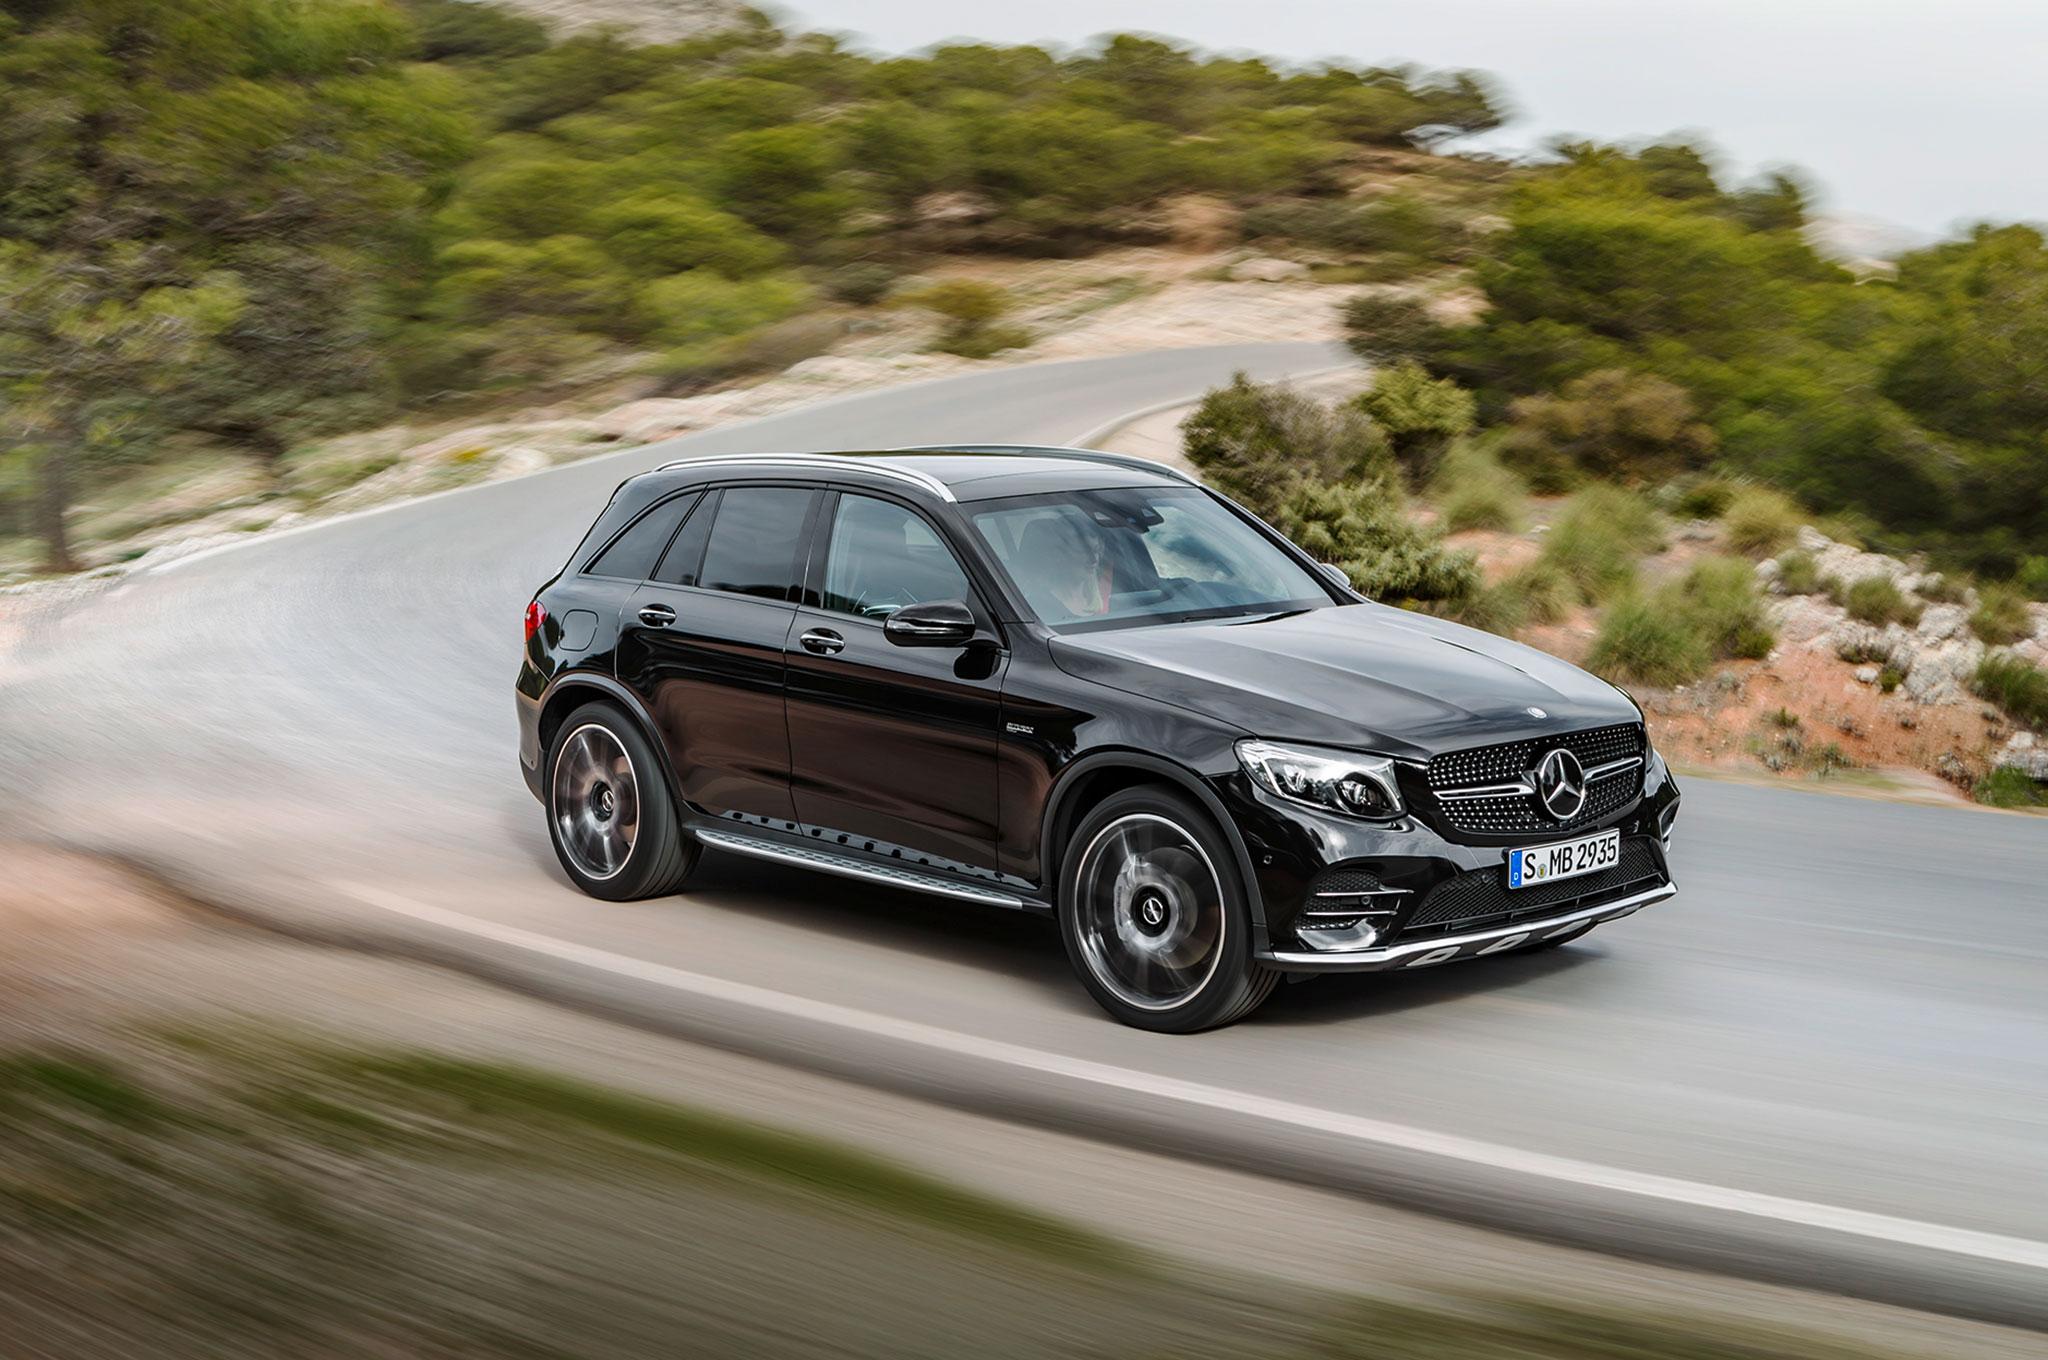 http://st.automobilemag.com/uploads/sites/11/2016/03/2017-Mercedes-AMG-GLC43-front-three-quarter-in-motion-02.jpg